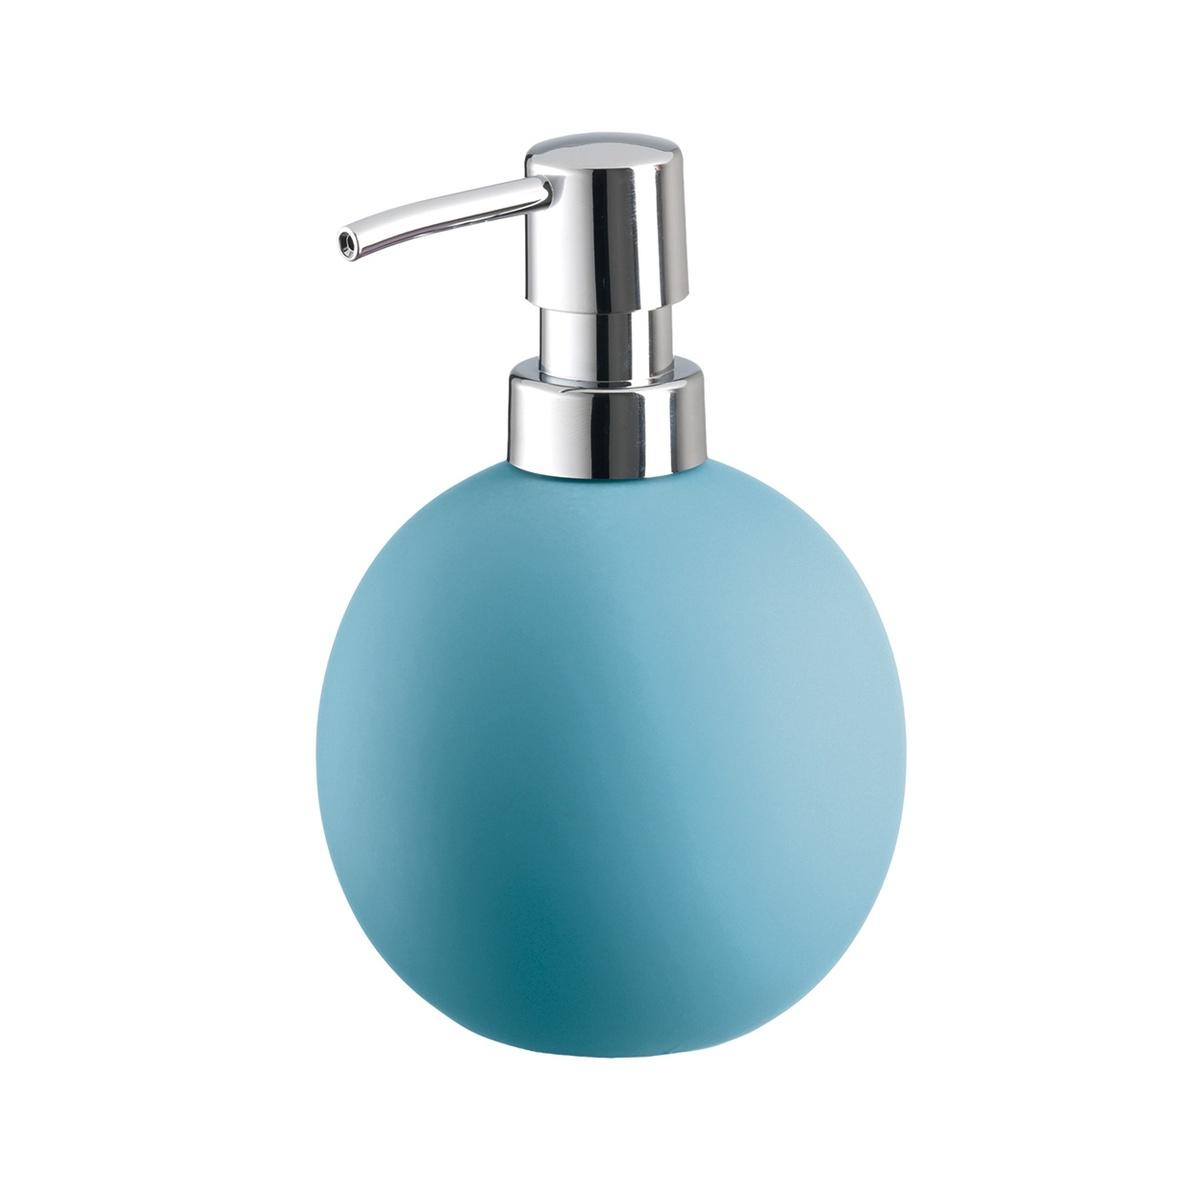 Kleine Wolke dávkovač mýdla Energy světle modrá